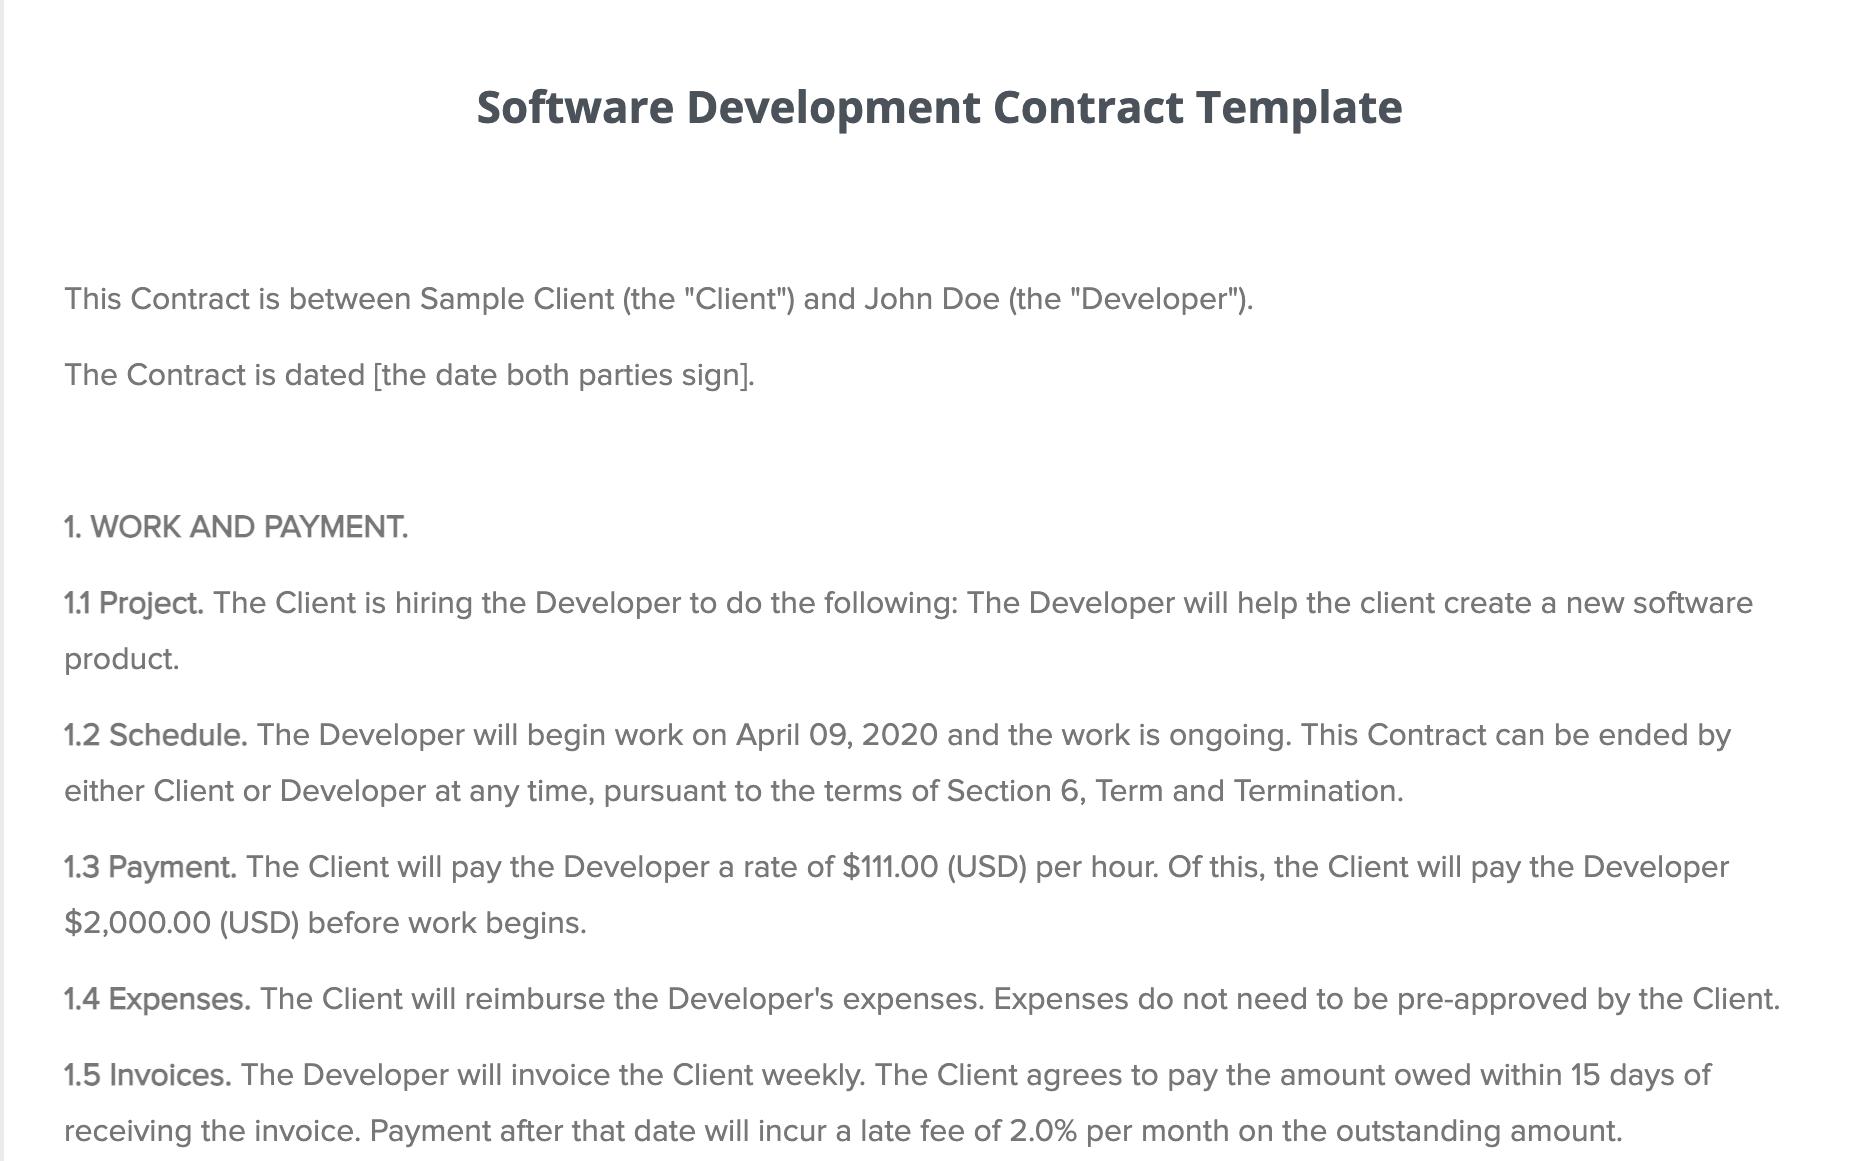 Software development contract covers developer's duties